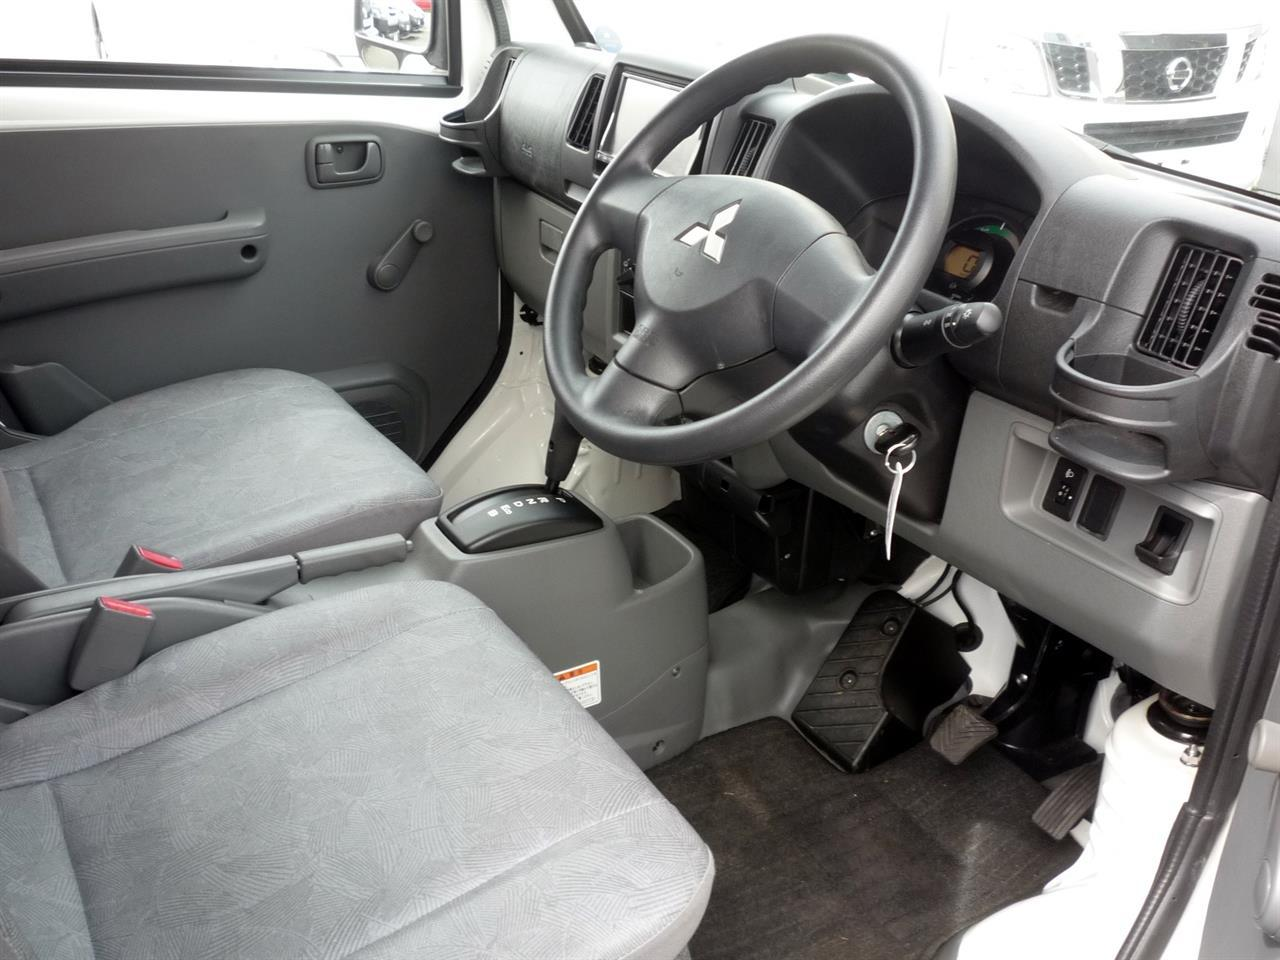 image-3, 2013 Mitsubishi MiniCab MiEV Electric Van at Dunedin